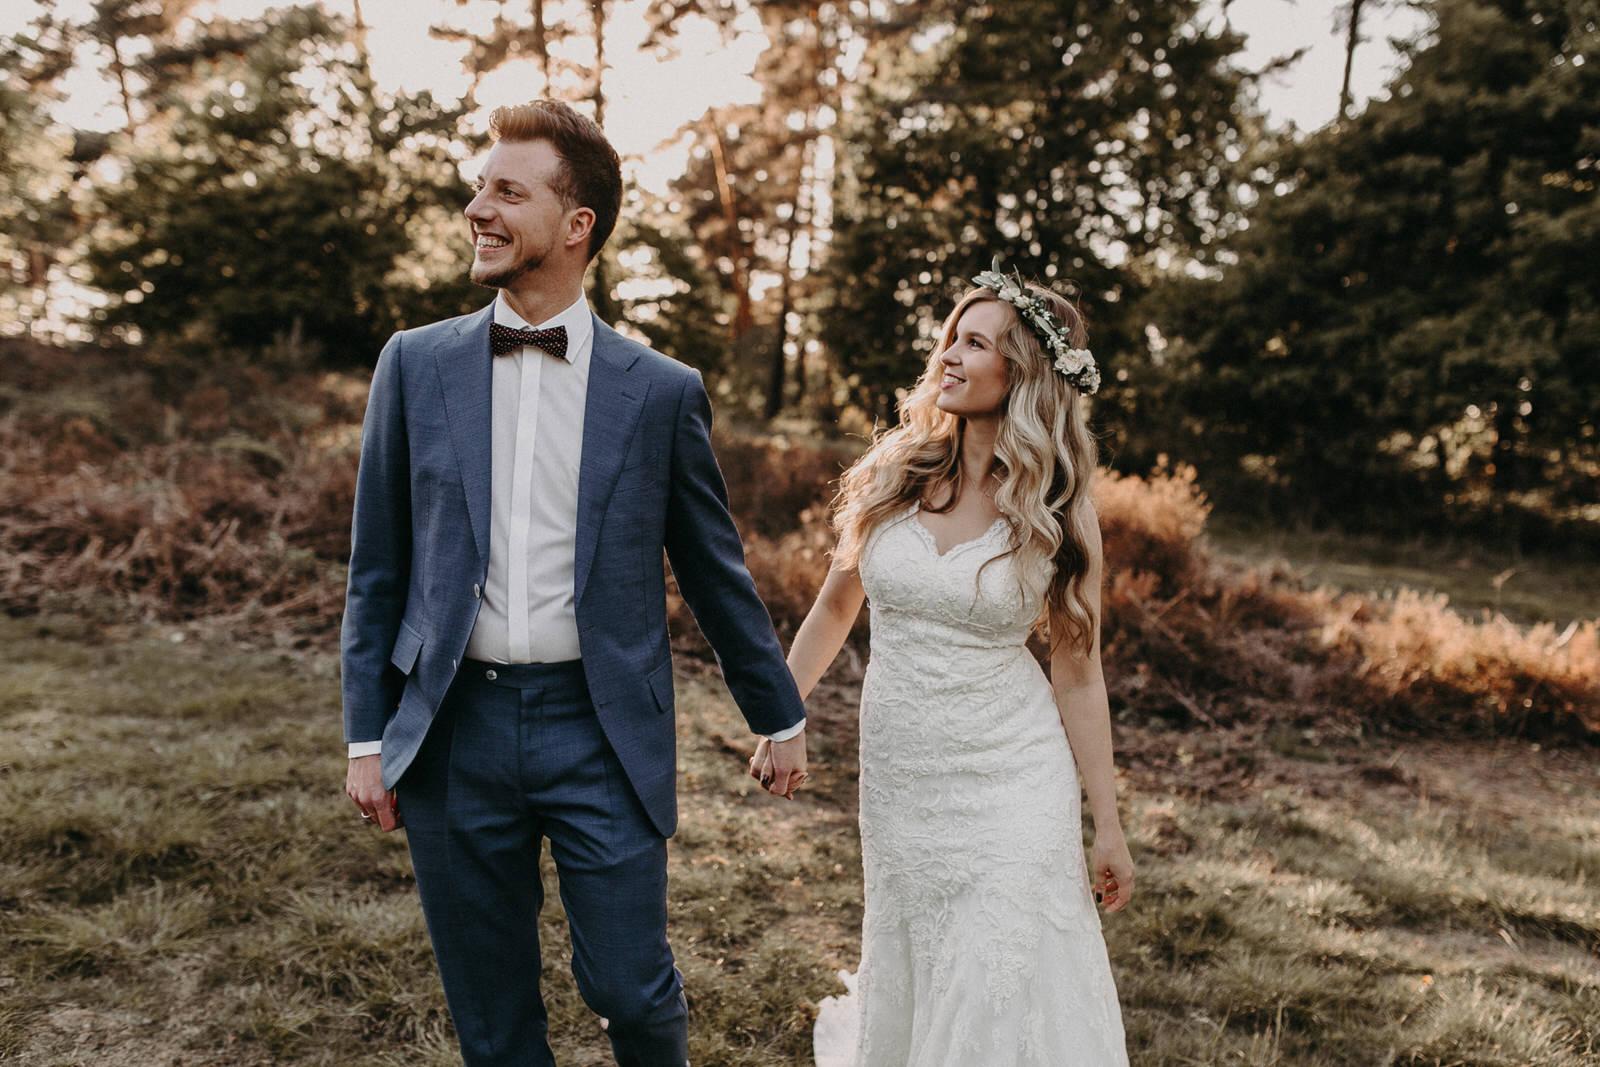 001Melle + Thomas After Wedding Shooting 5.5.18.jpg